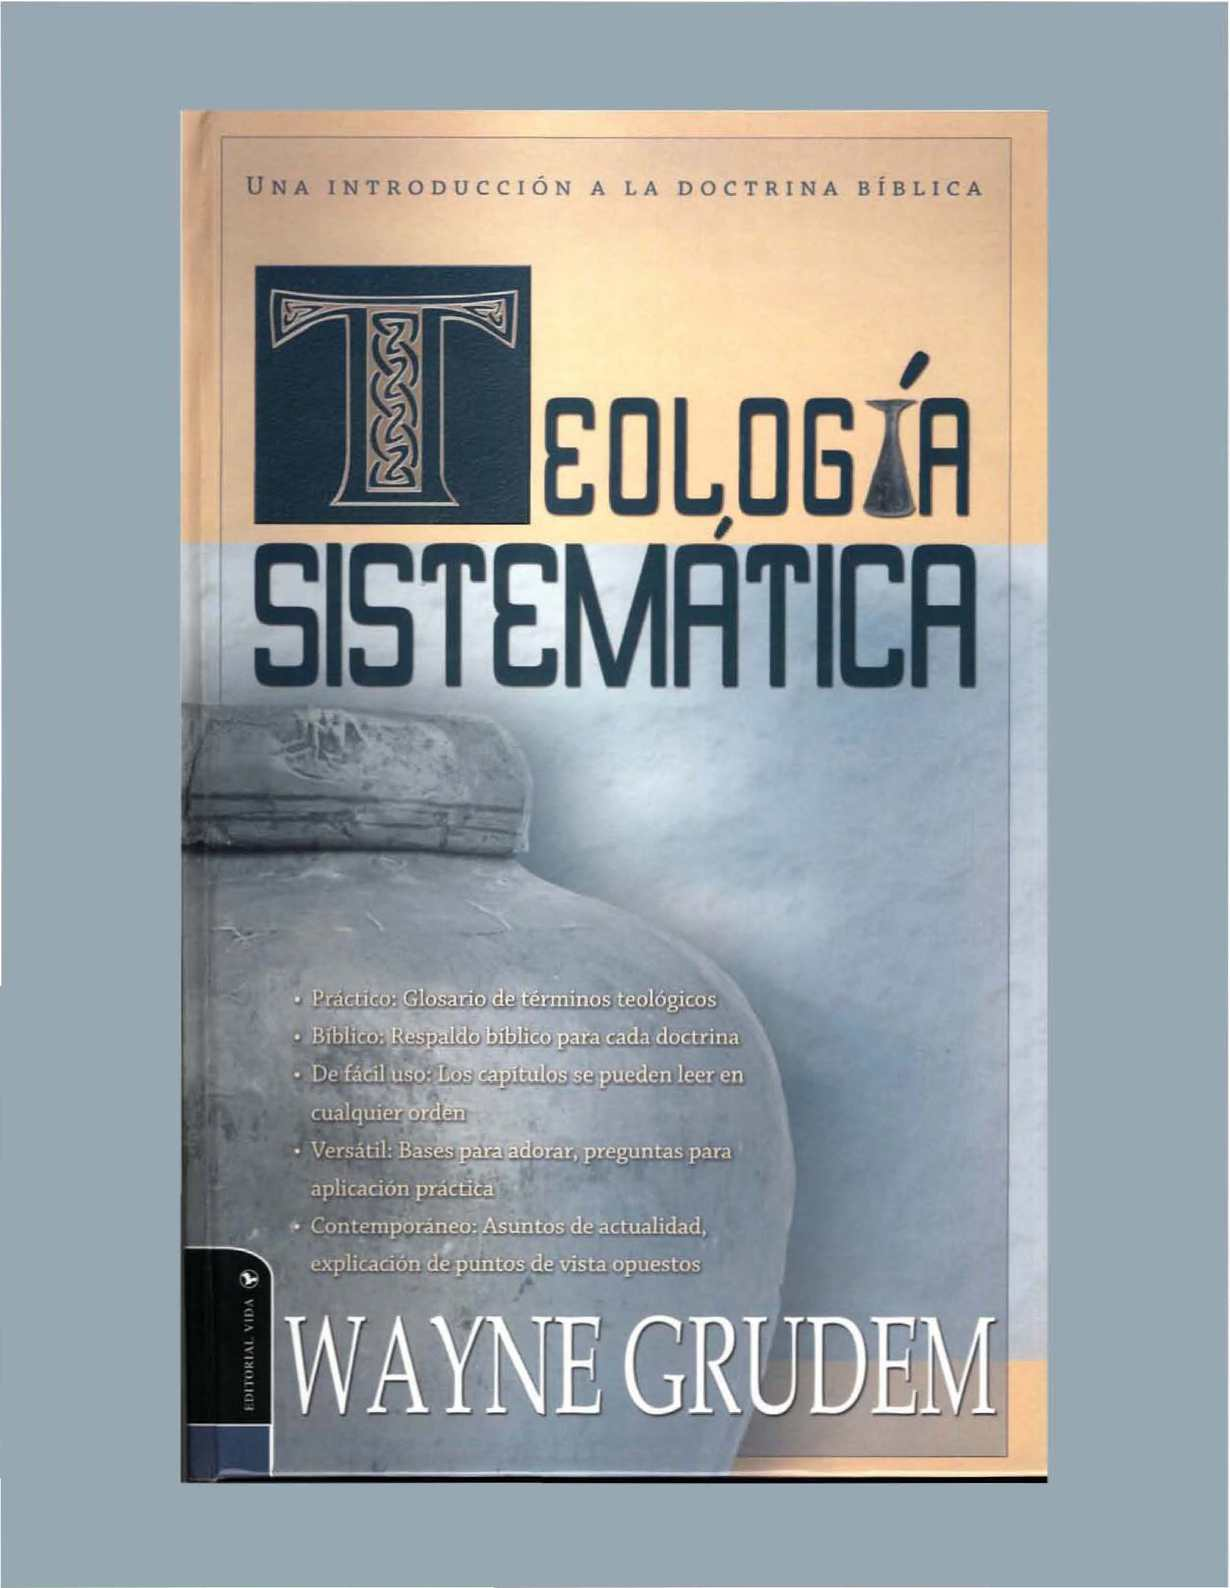 teologia sistematica de grudem